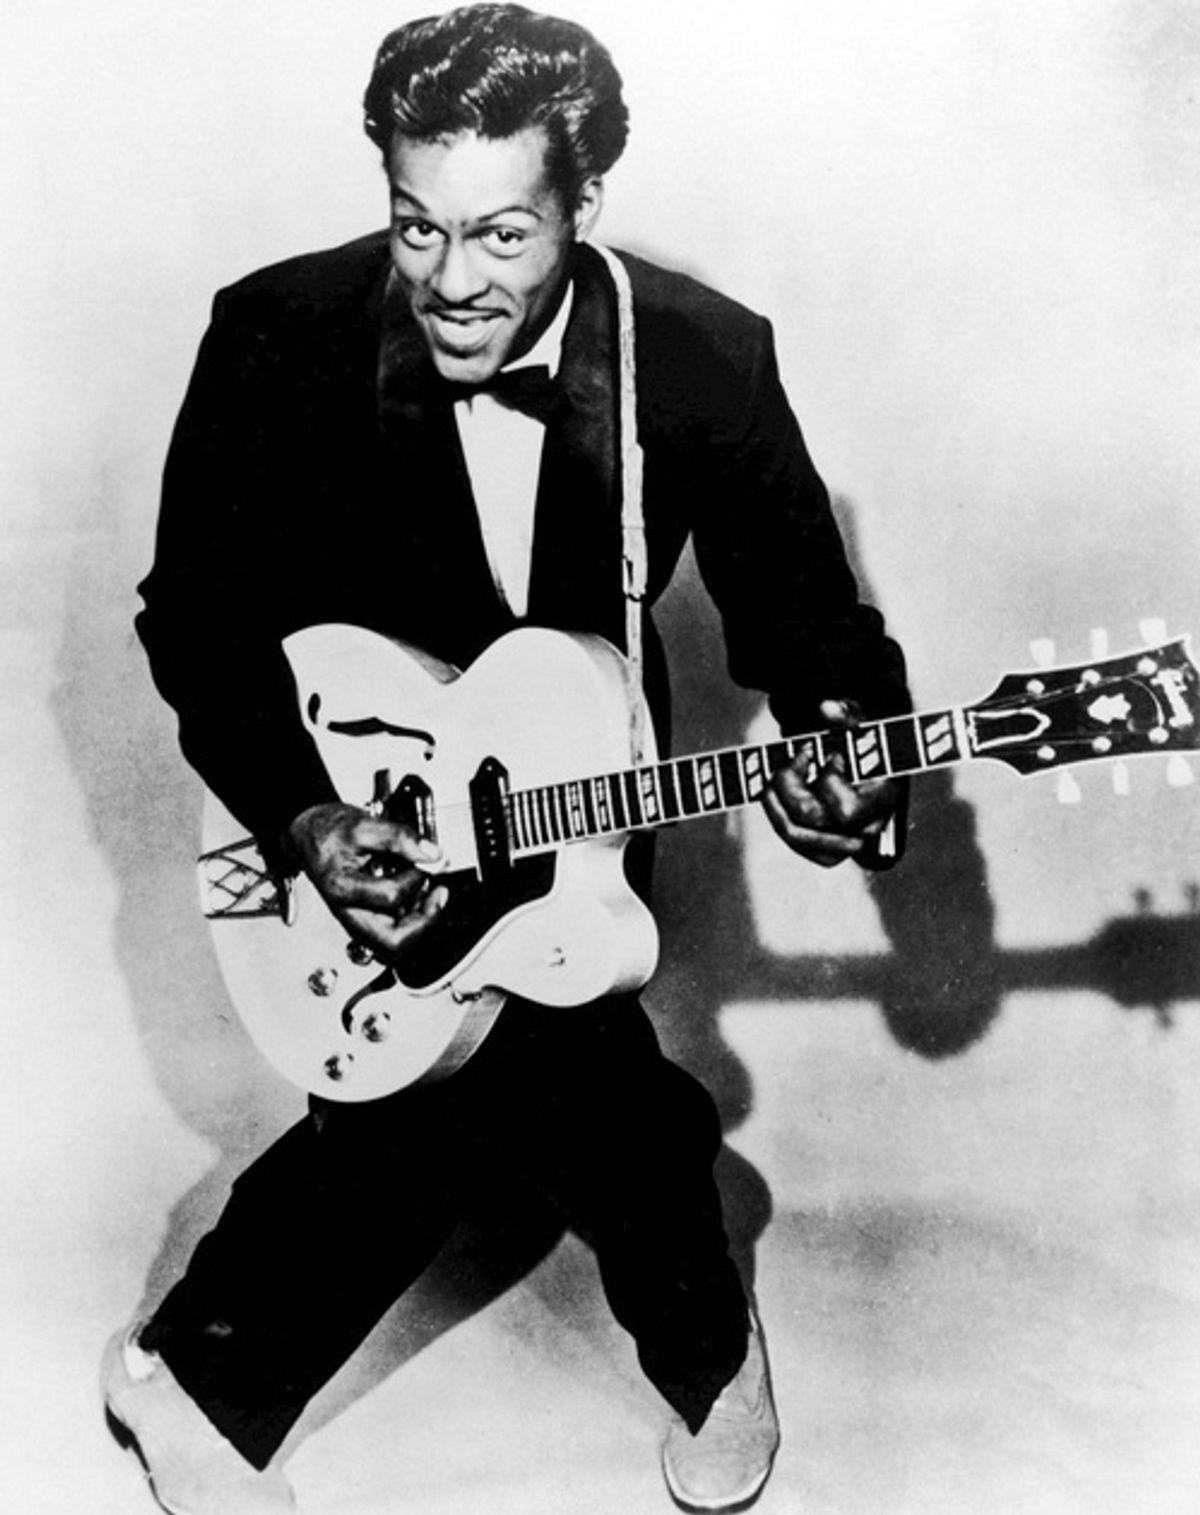 Chuck Berry: 1926–2017